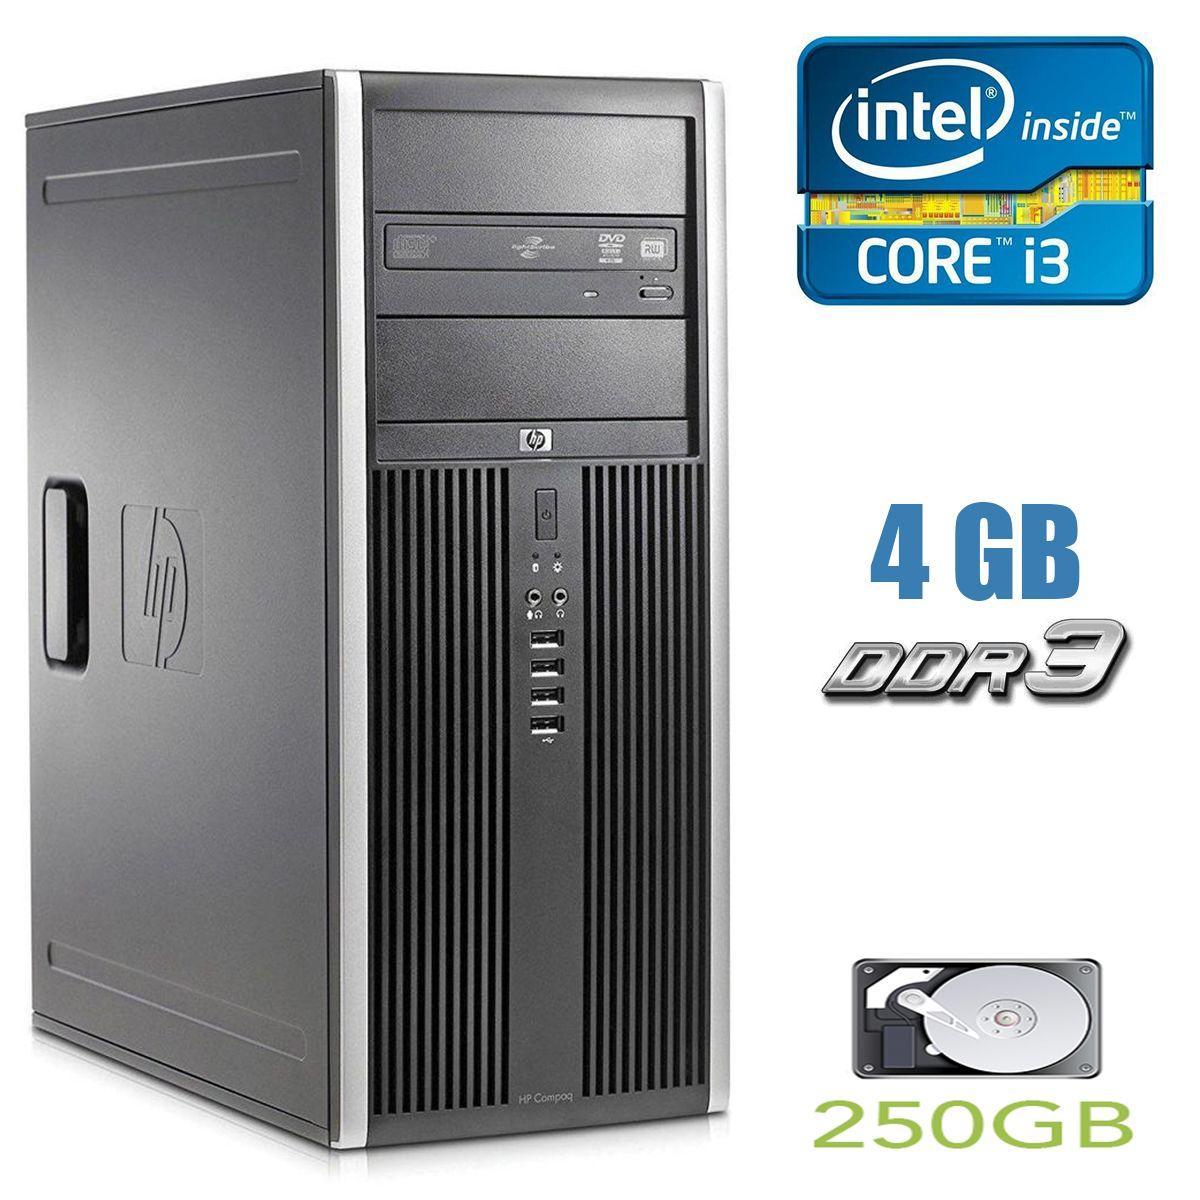 HP Compaq Elite 8100 MT / Intel Core i3-540 (2 (4) ядра по 3.06GHz) / 4GB DDR3 / 250GB HDD